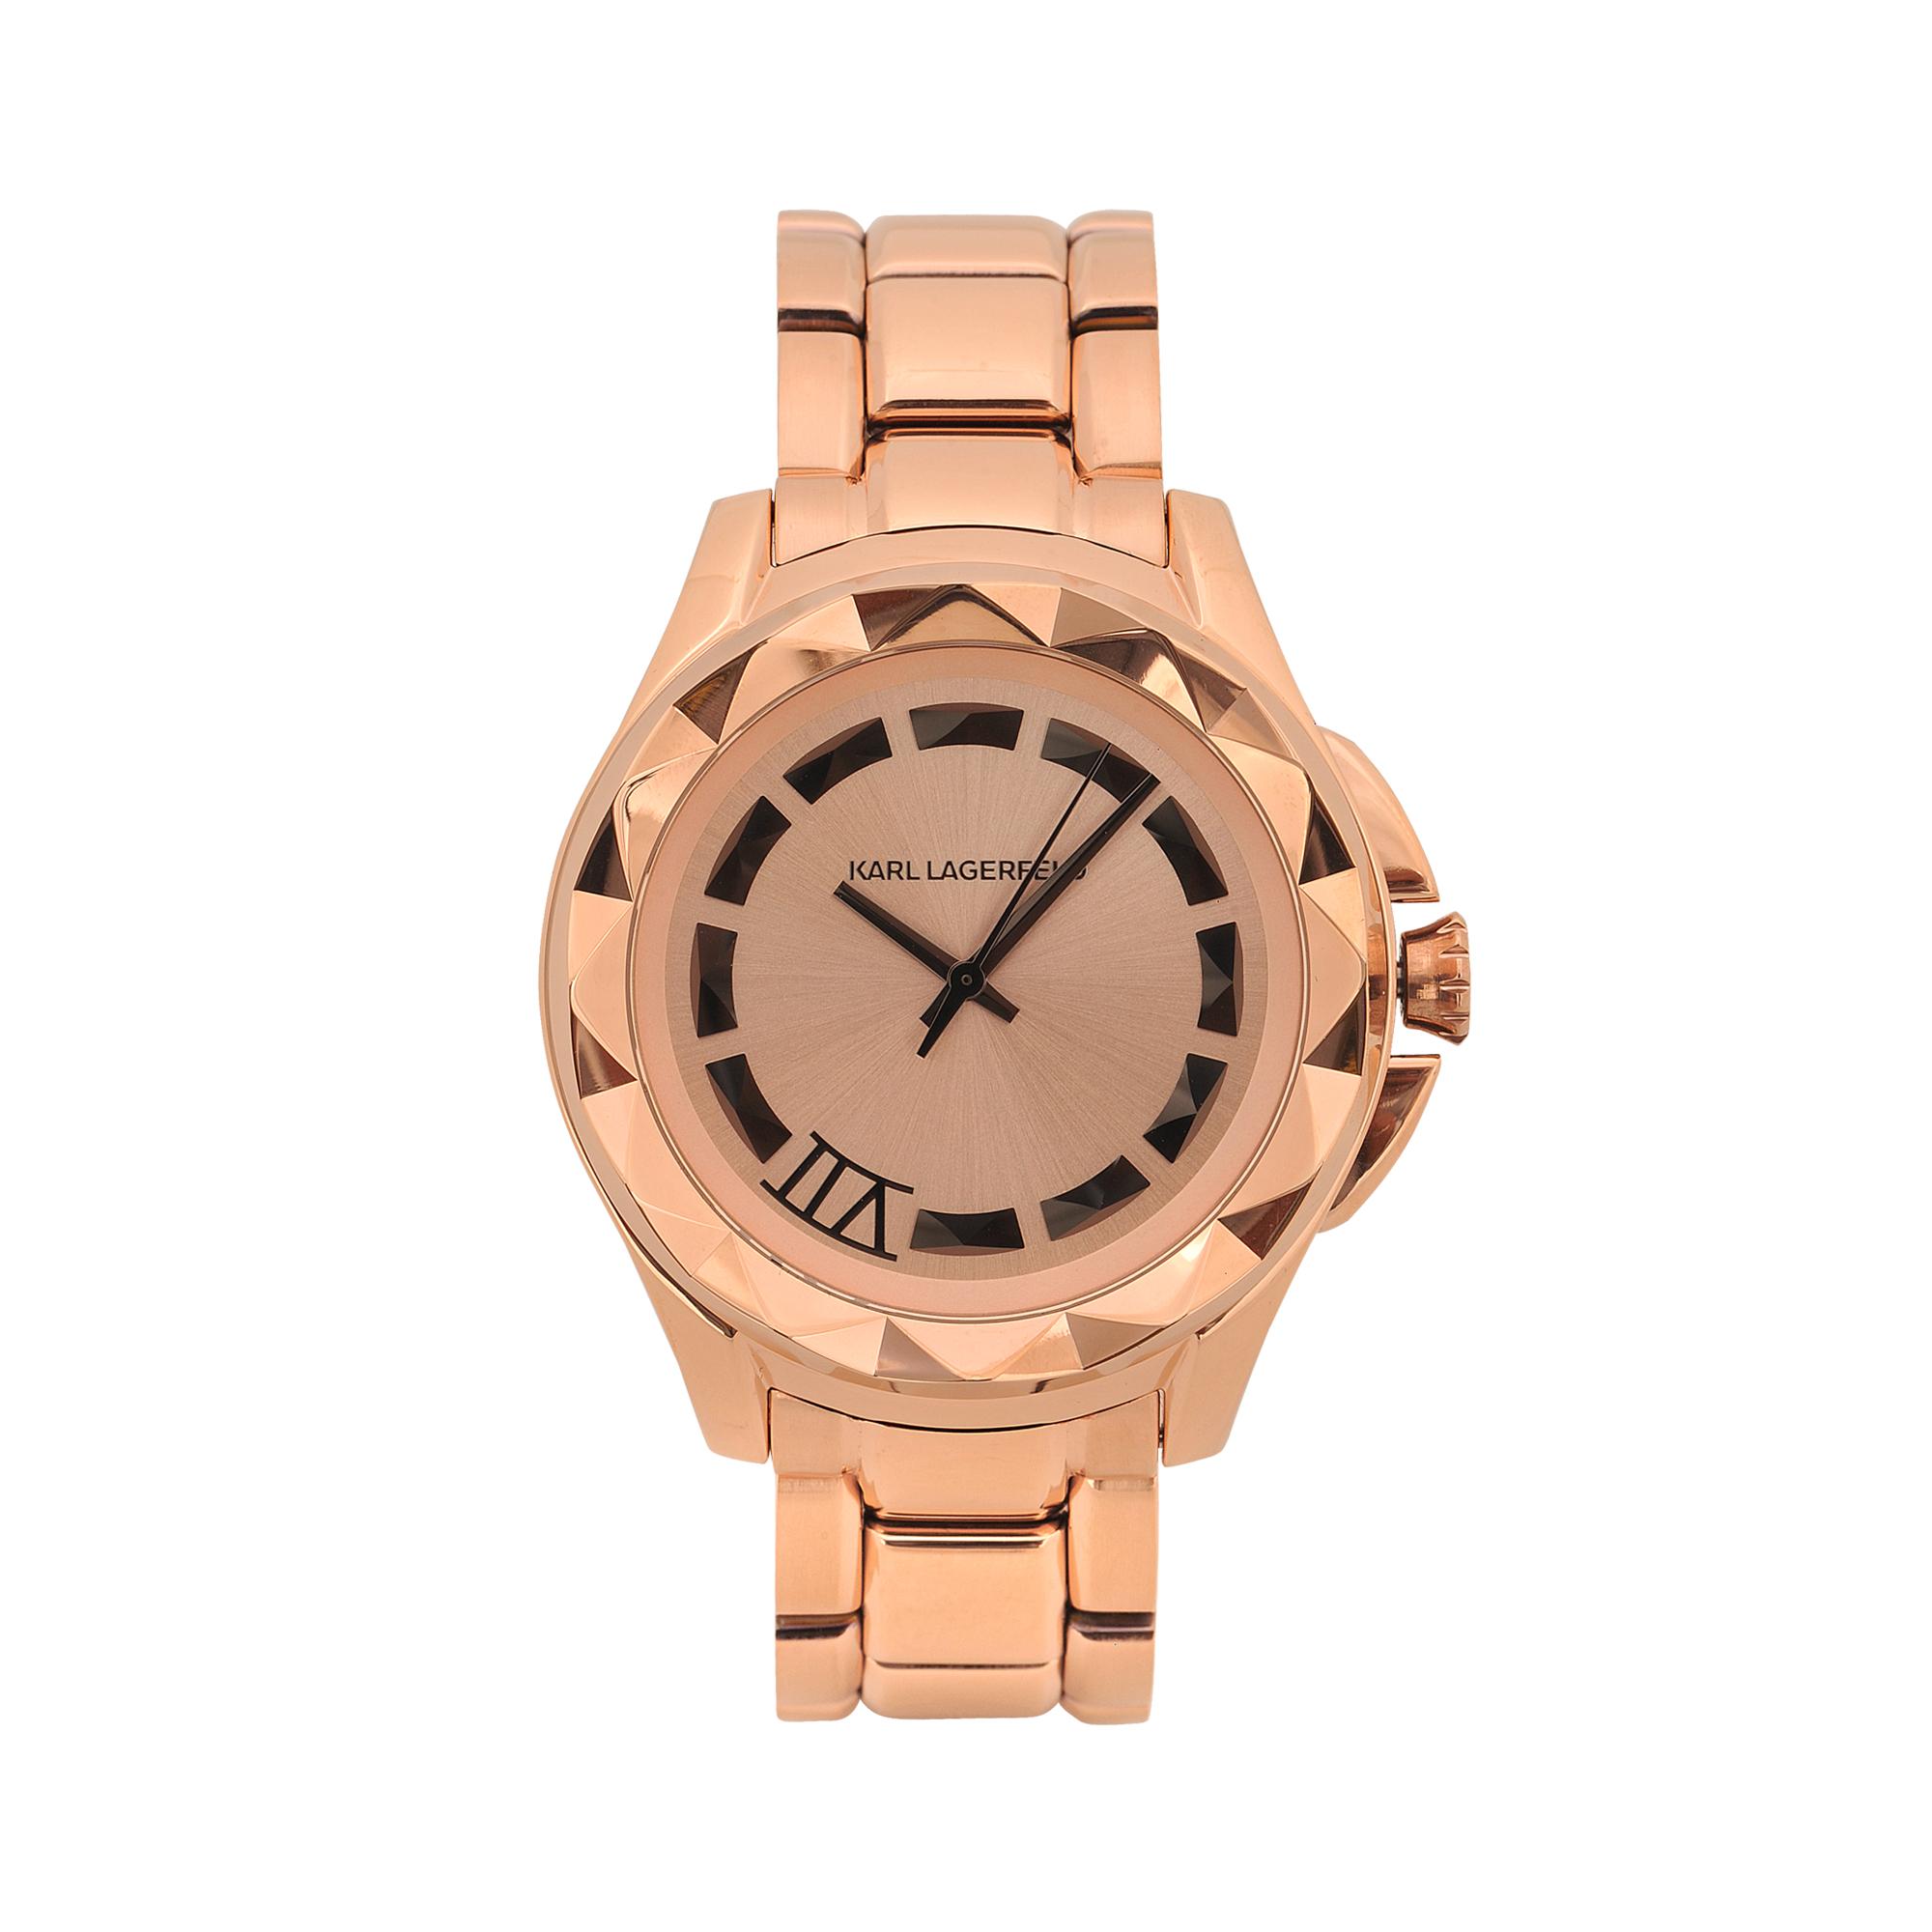 karl lagerfeld kl1032 karl 7 watch in gold lyst. Black Bedroom Furniture Sets. Home Design Ideas